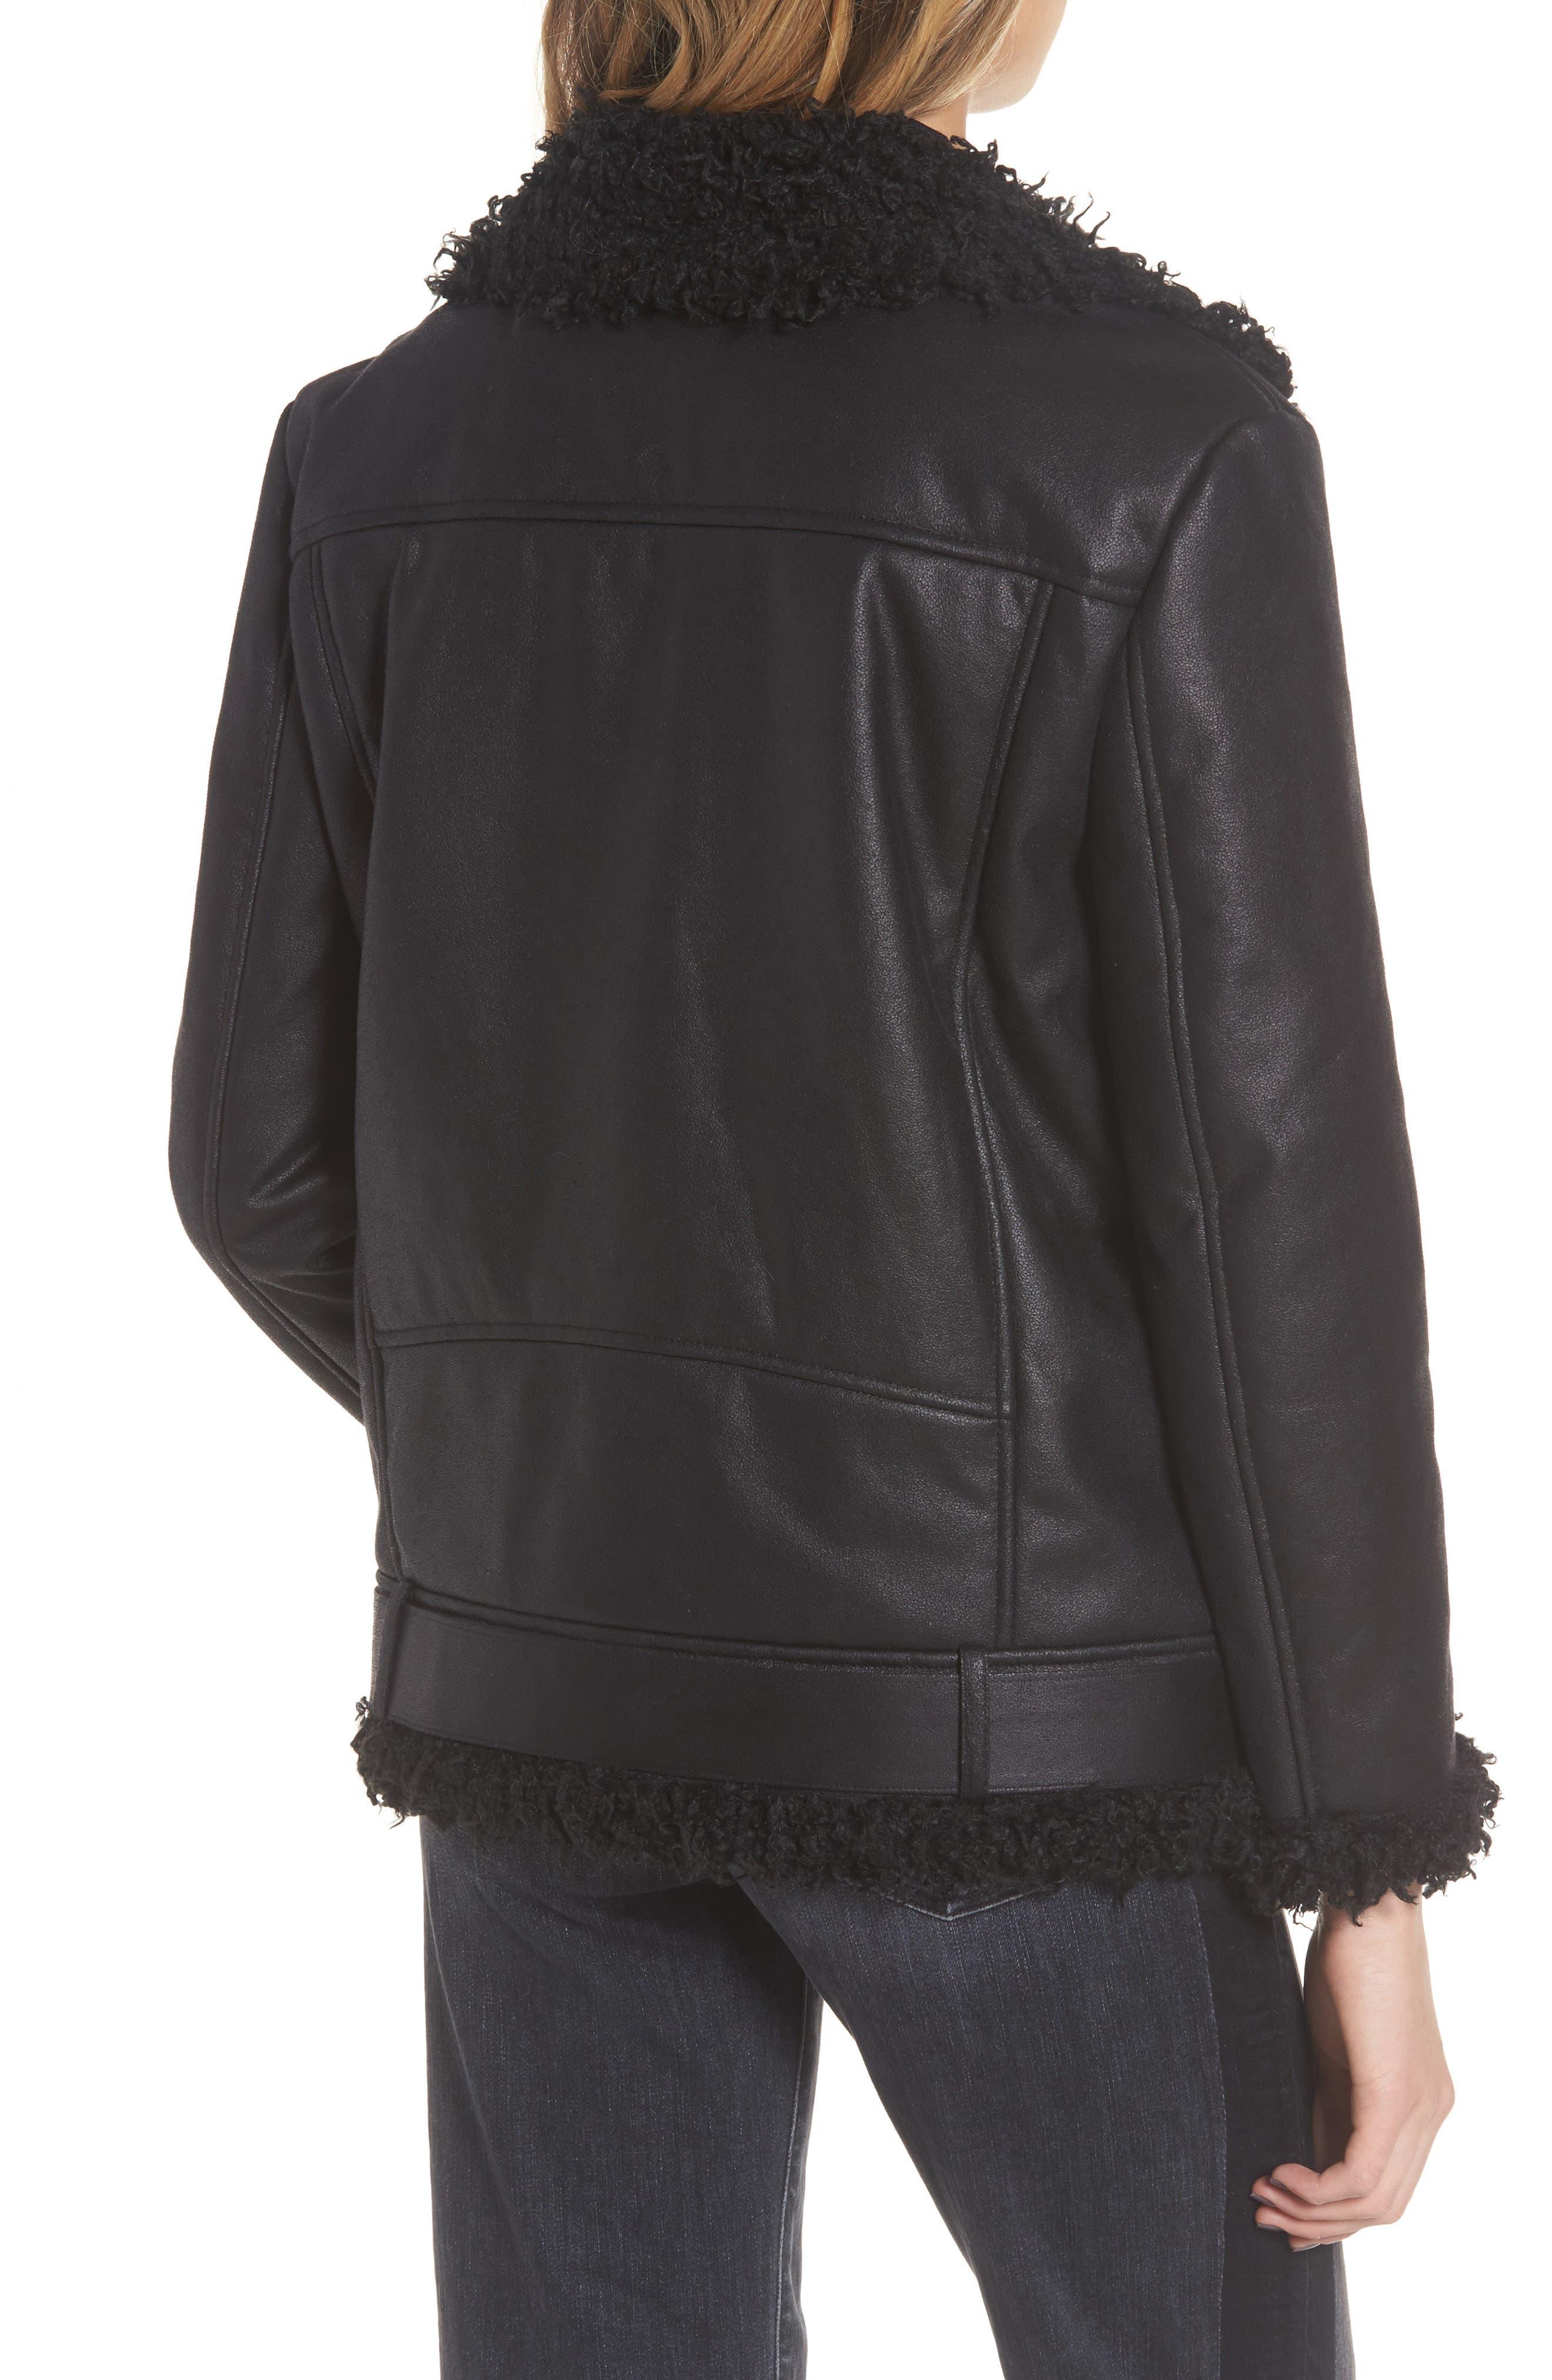 Bosworth Faux Shearling Jacket,                             Alternate thumbnail 2, color,                             001